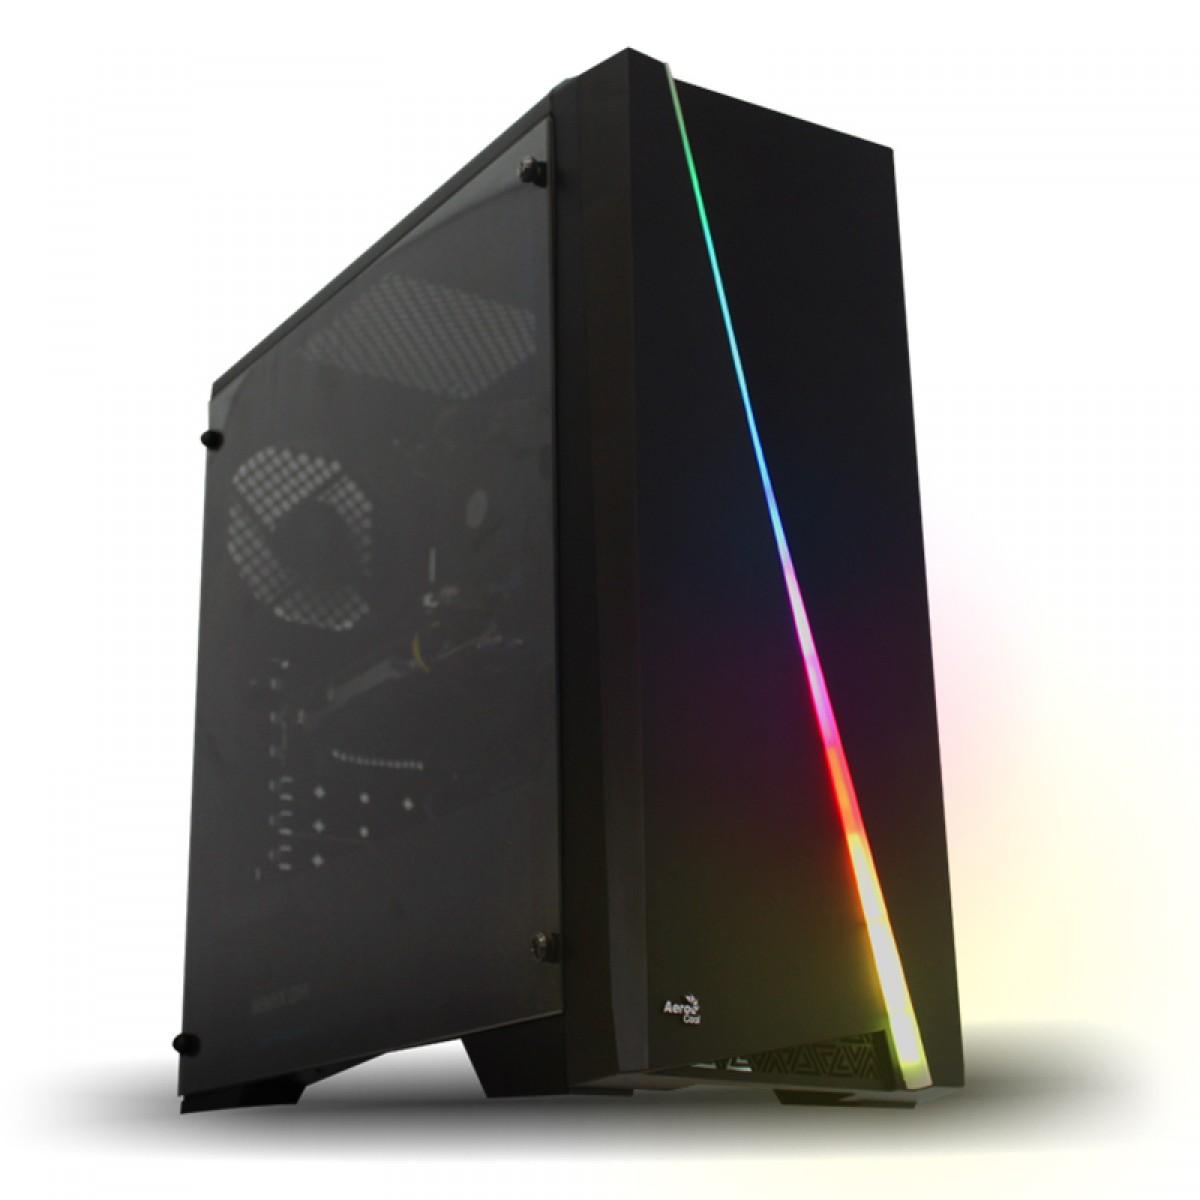 Pc Gamer Tera Edition AMD Ryzen 5 3500 / Radeon NAVI RX 5500 XT 8GB / DDR4 8GB / HD 1TB / 600W